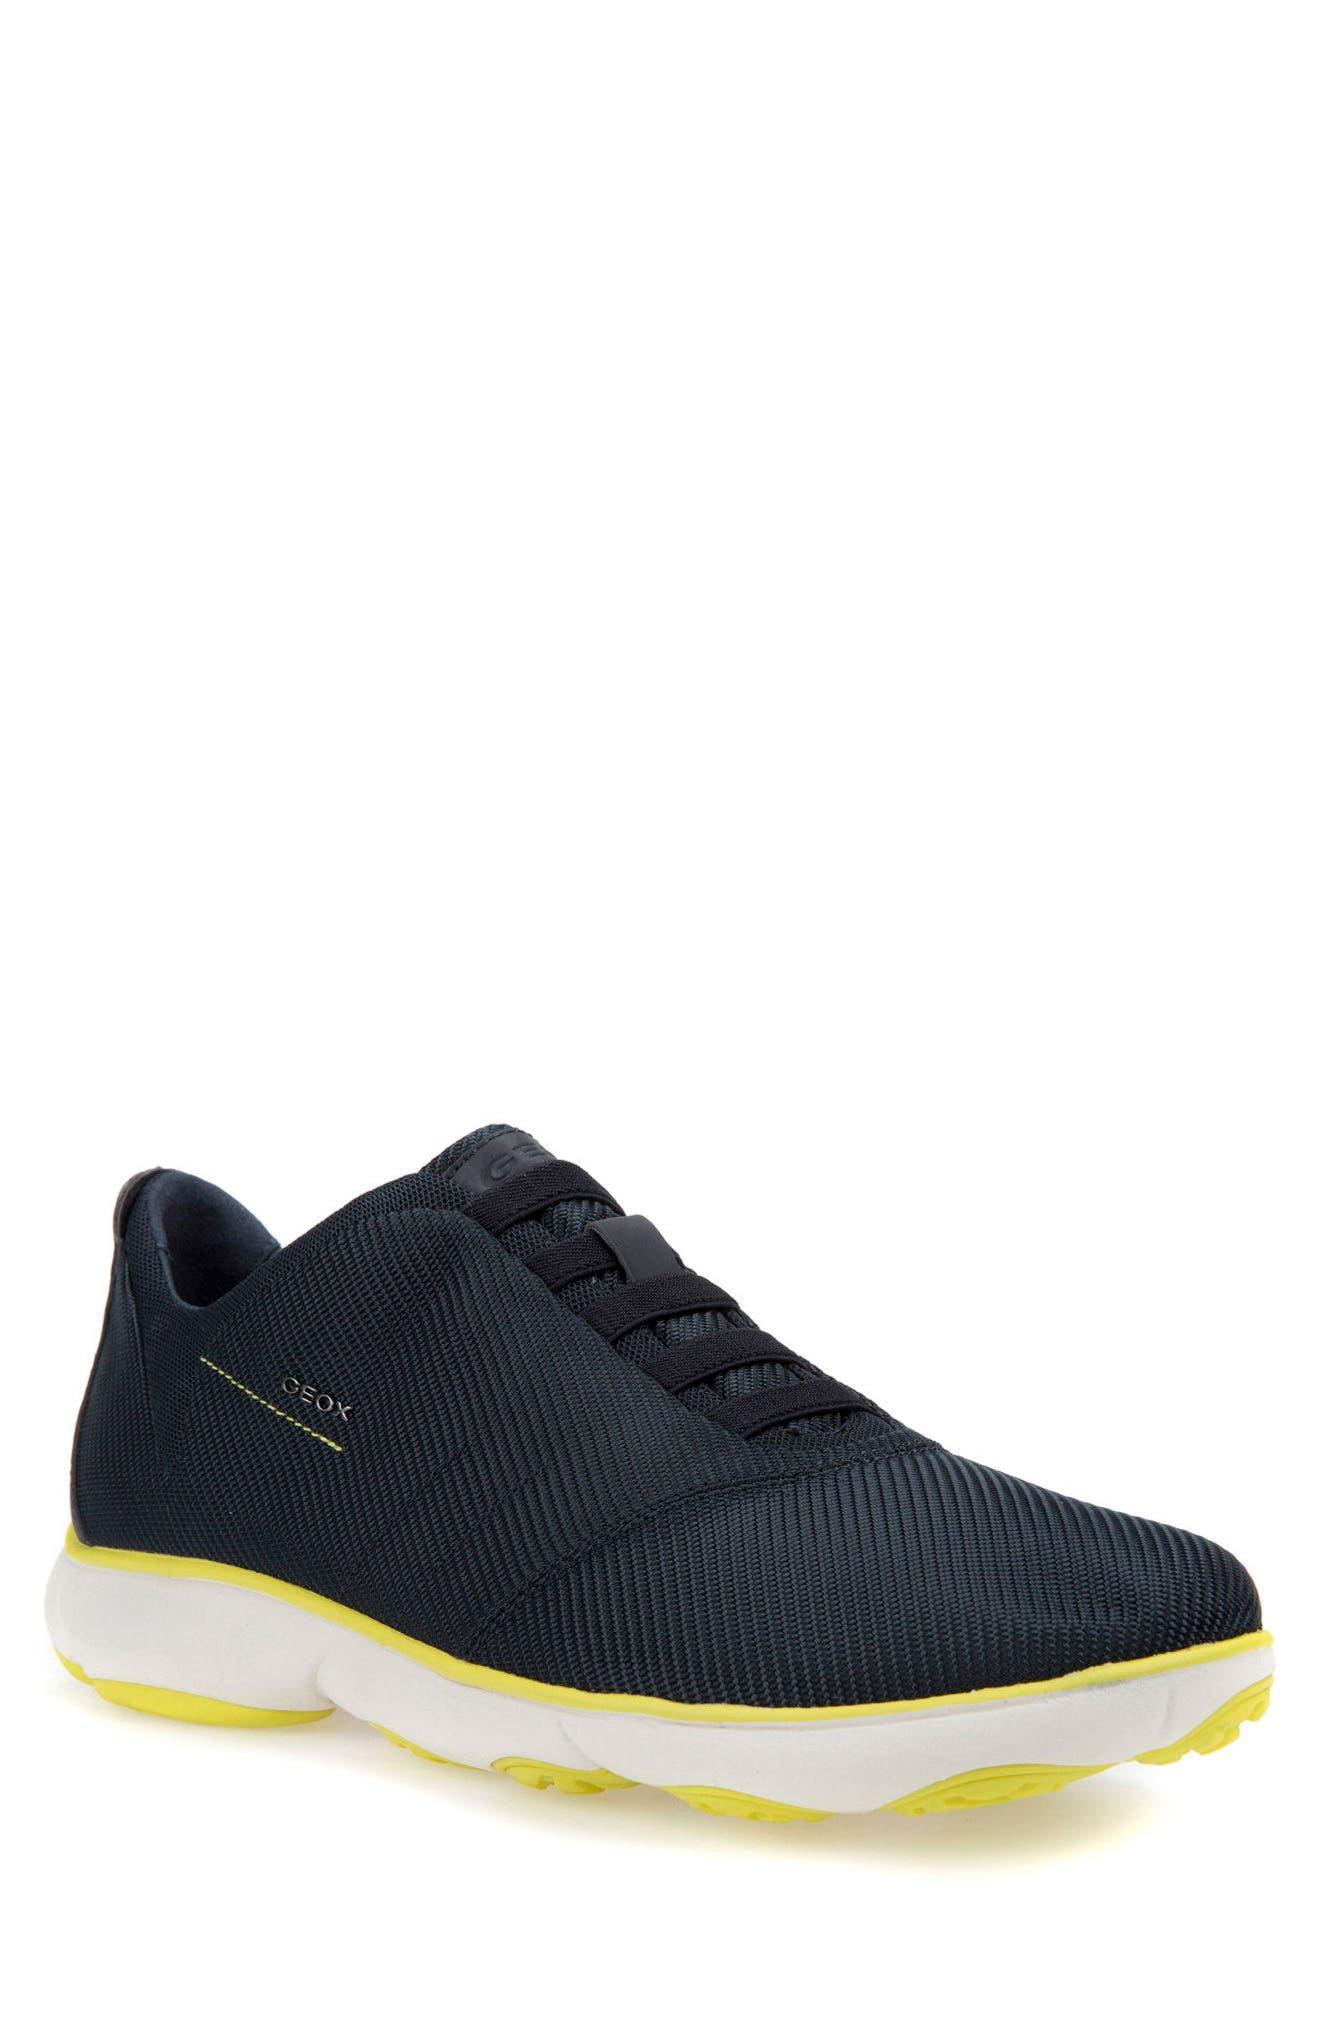 Nebula 35 Slip-On Sneaker,                         Main,                         color, Navy